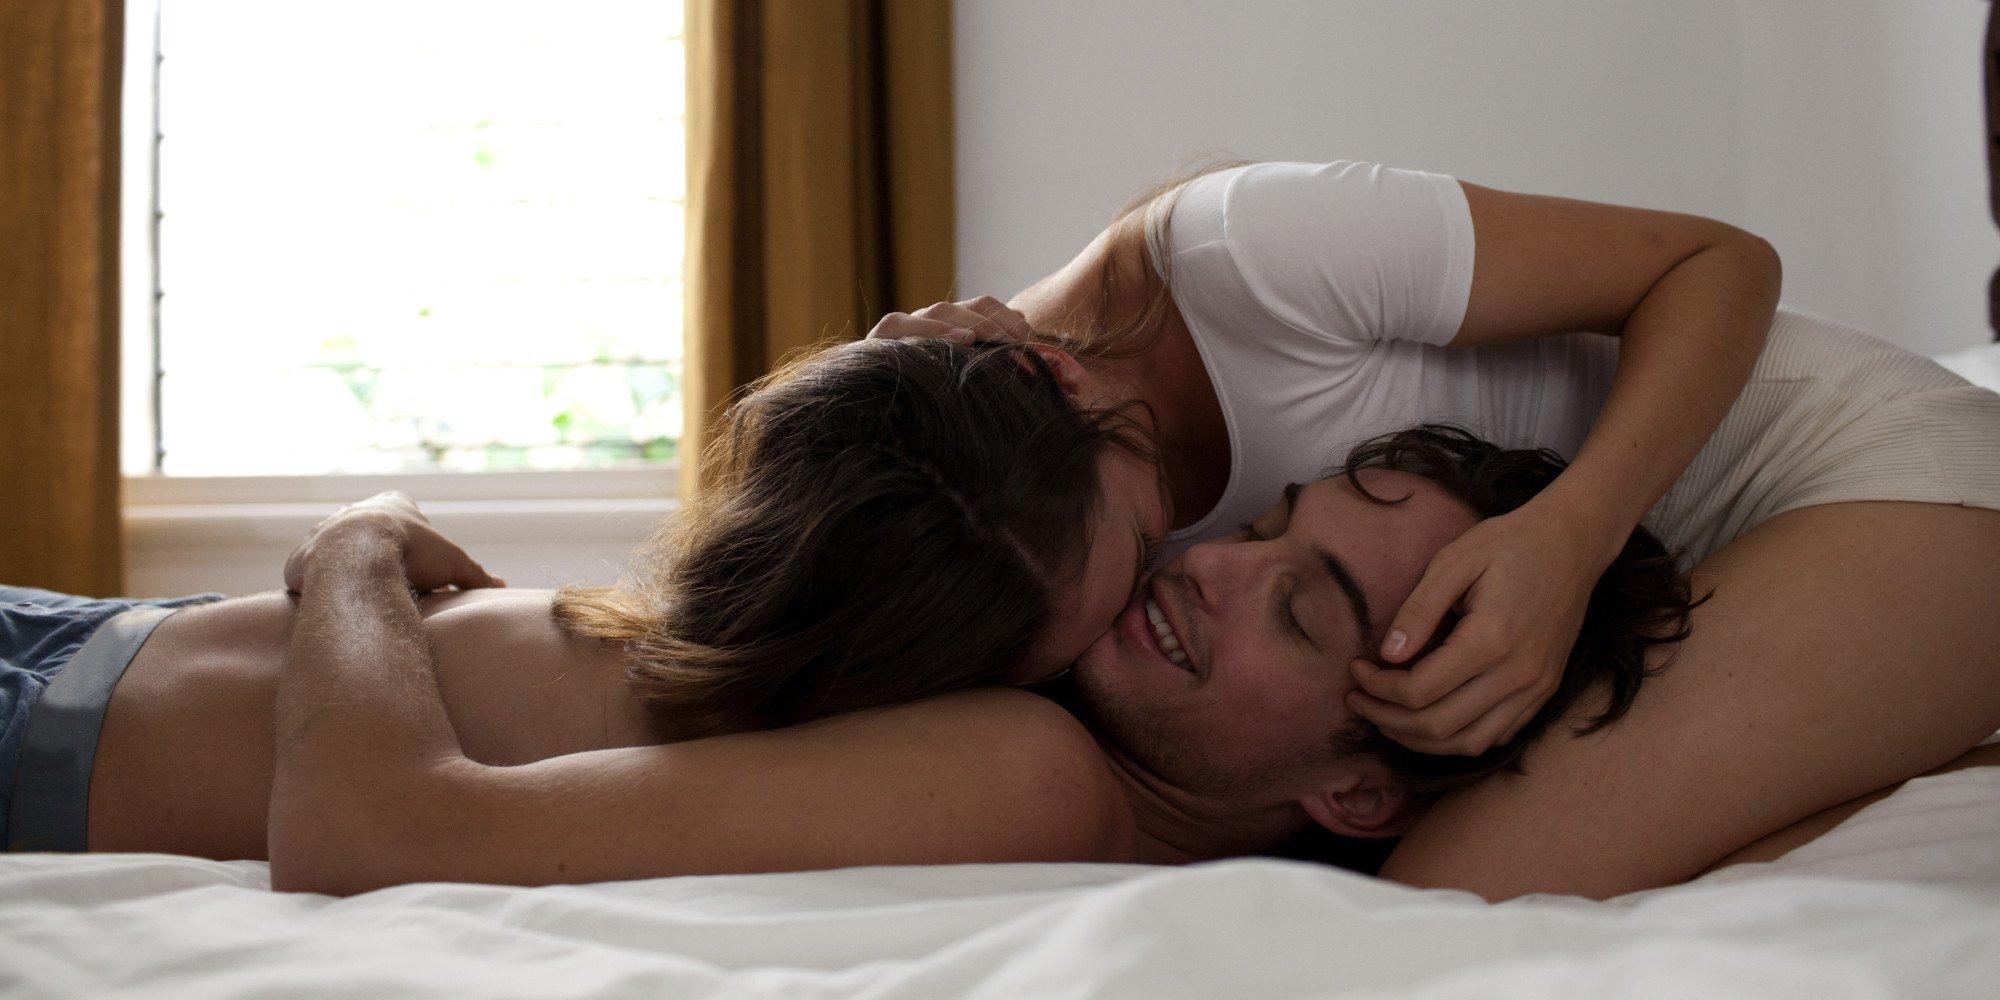 xnxx-best-way-have-sex-video-girl-porn